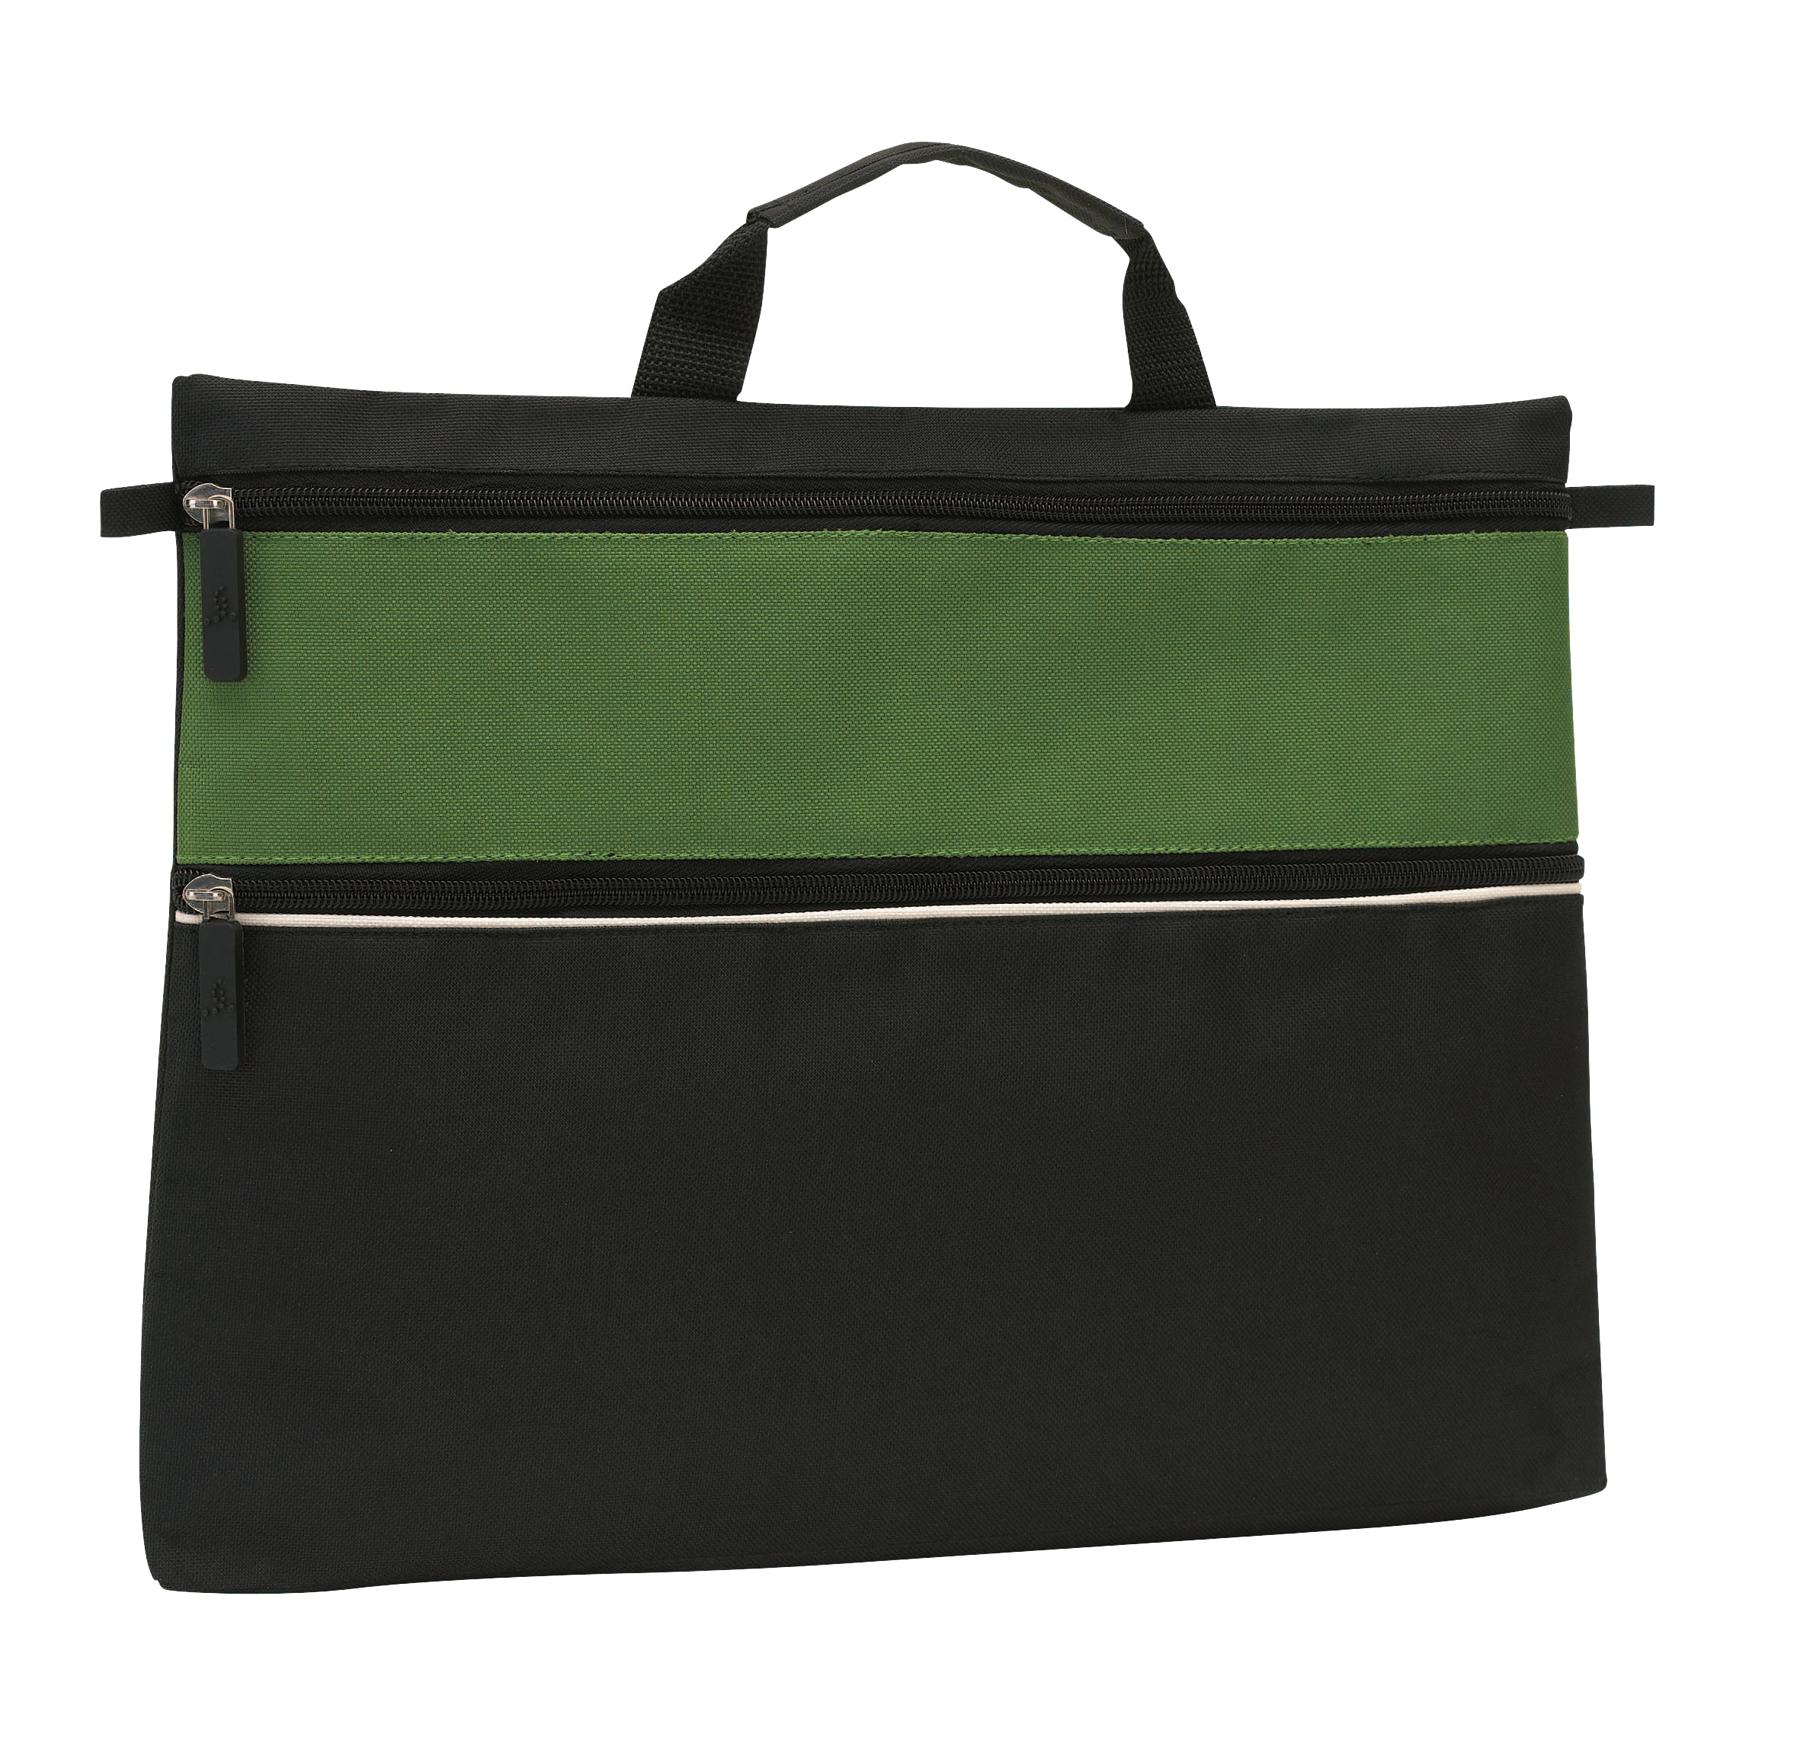 Torba na dokumenty FILE, czarny, zielony